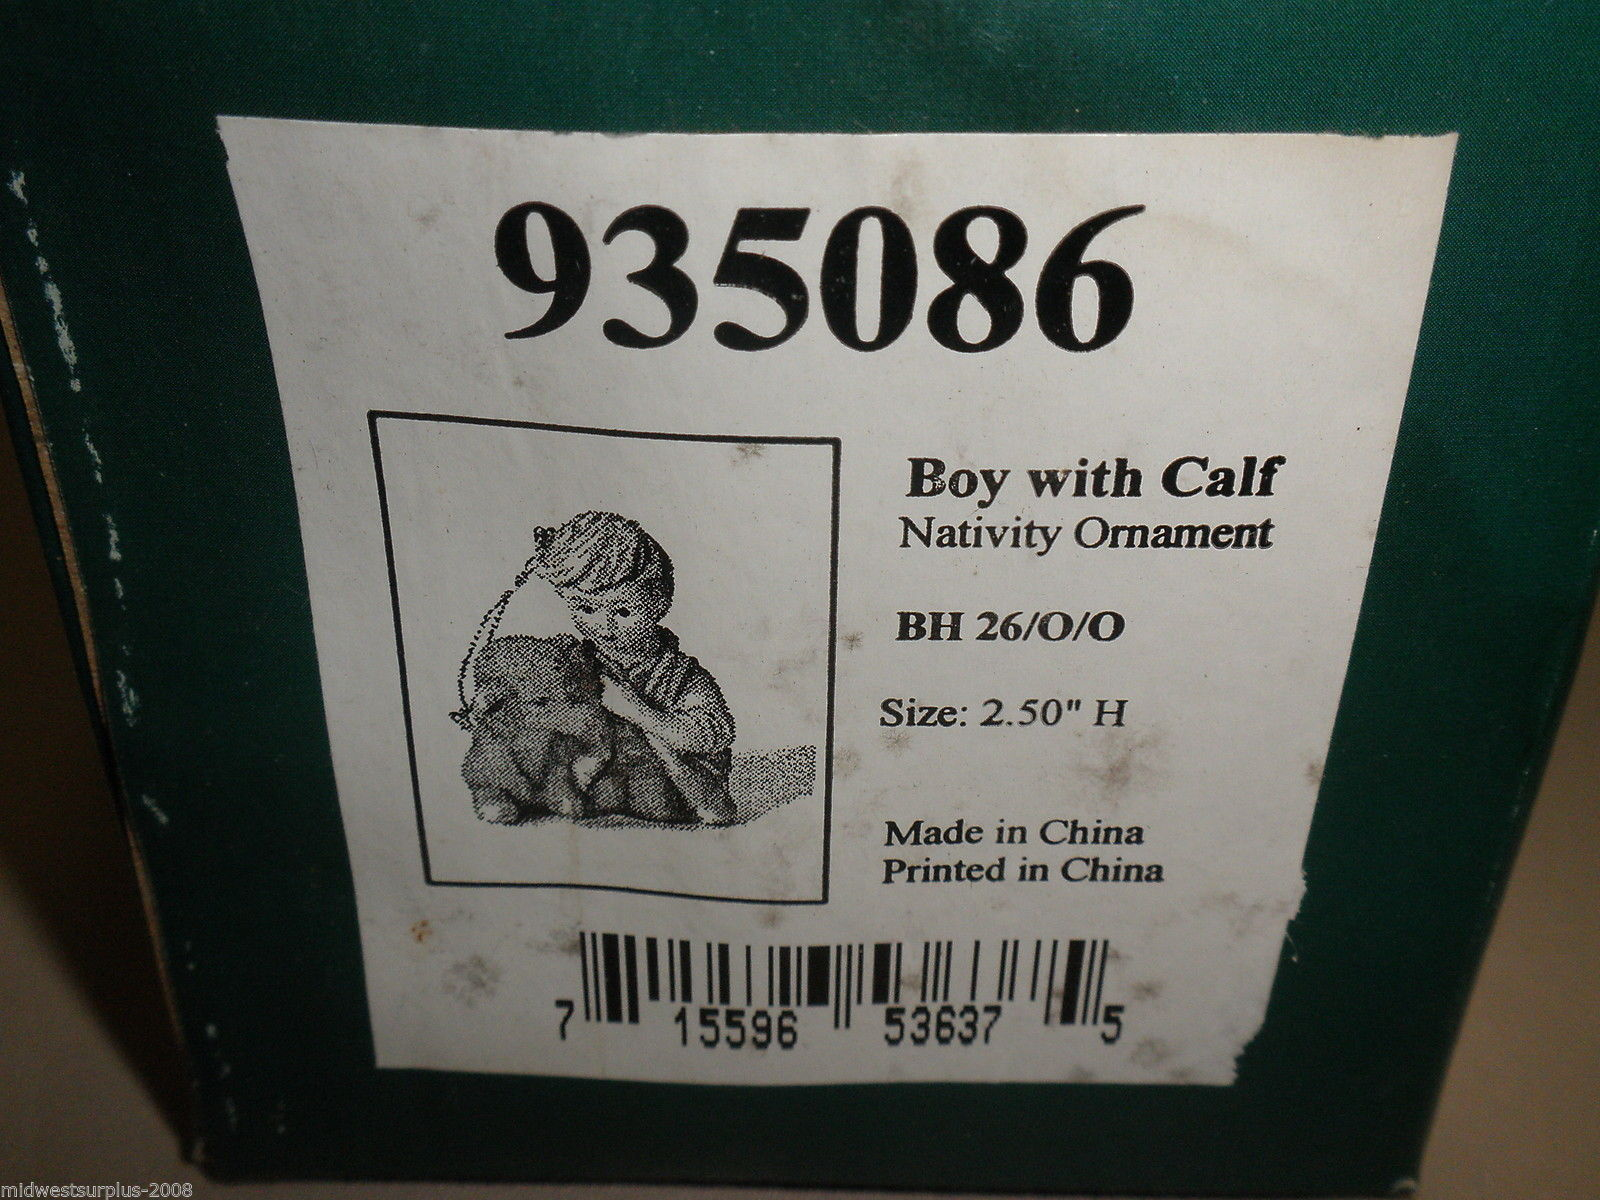 Goebel Berta Hummel Boy with Calf Nativity Ornament #935086